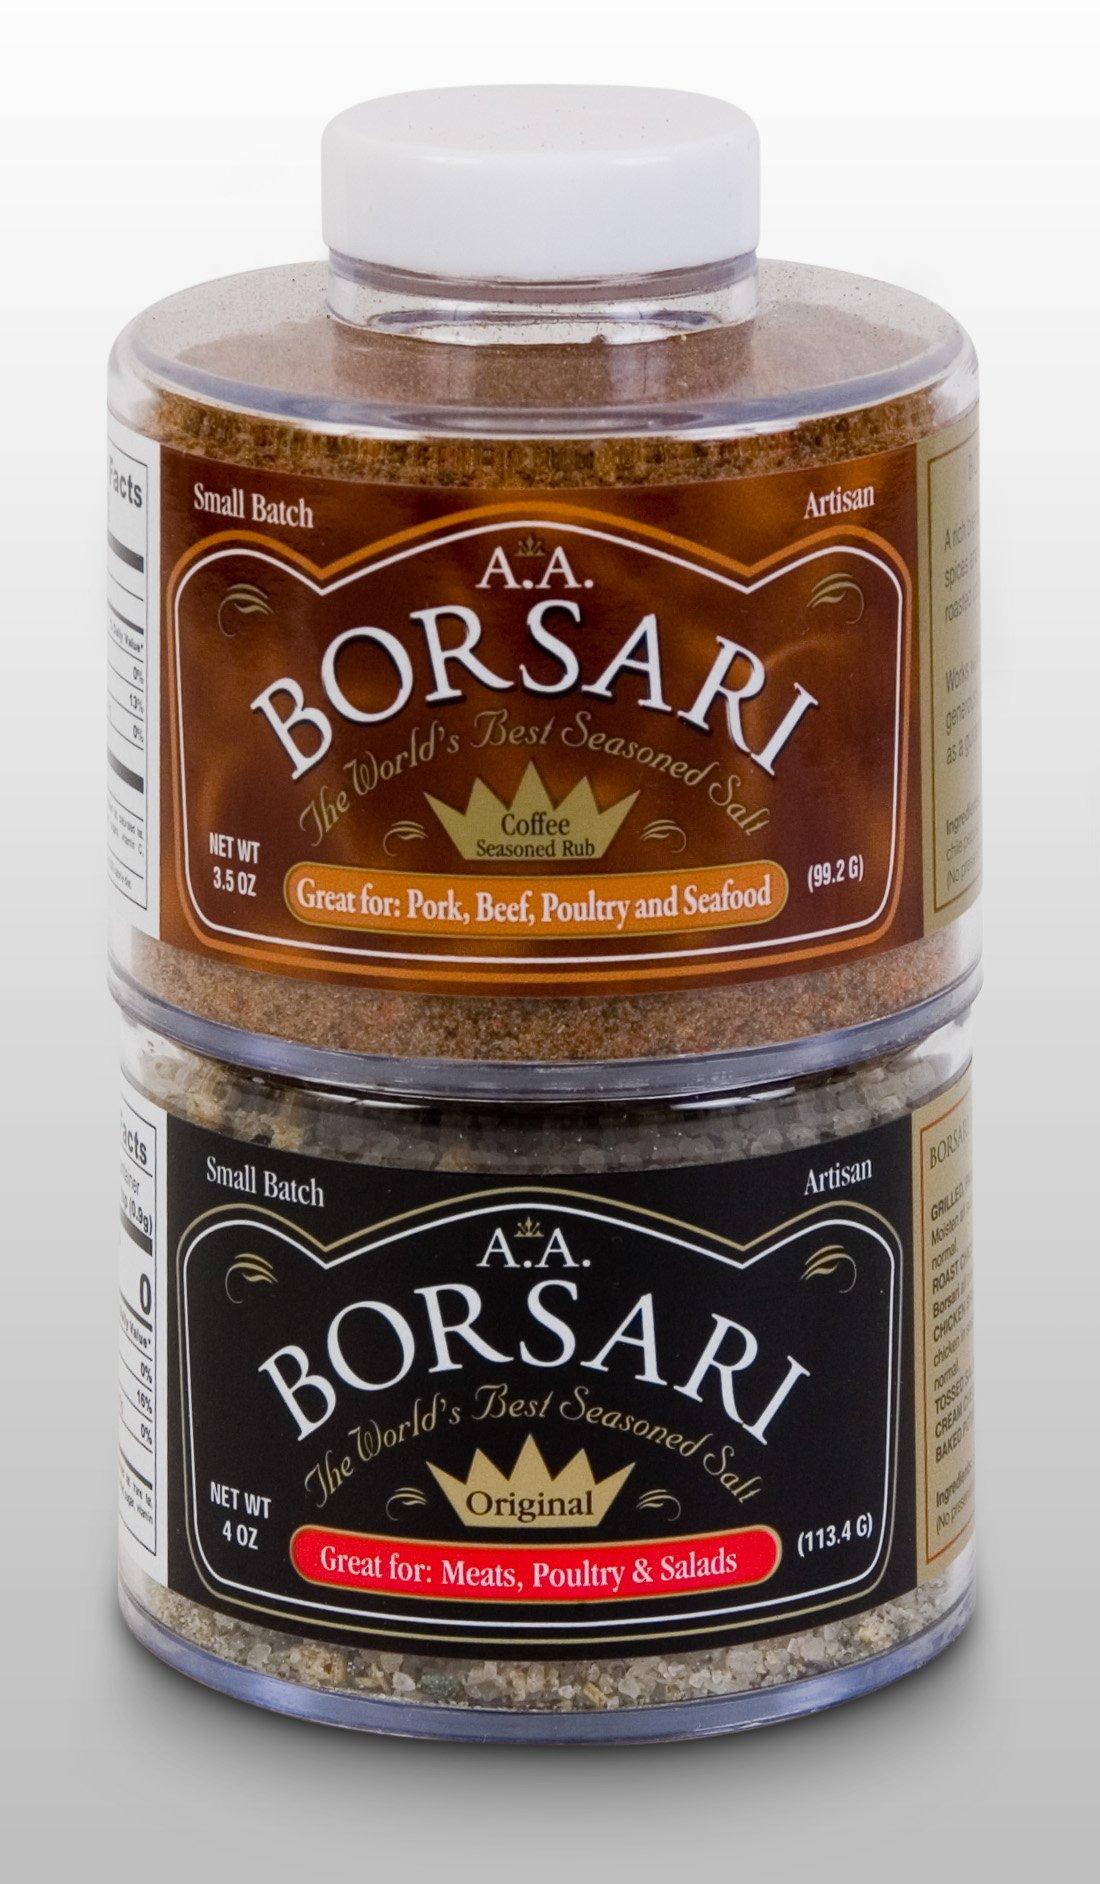 Borsari All Natural Seasoned Salt Combo, Original Seasoning and Coffee Rub, Gluten Free, No MSG